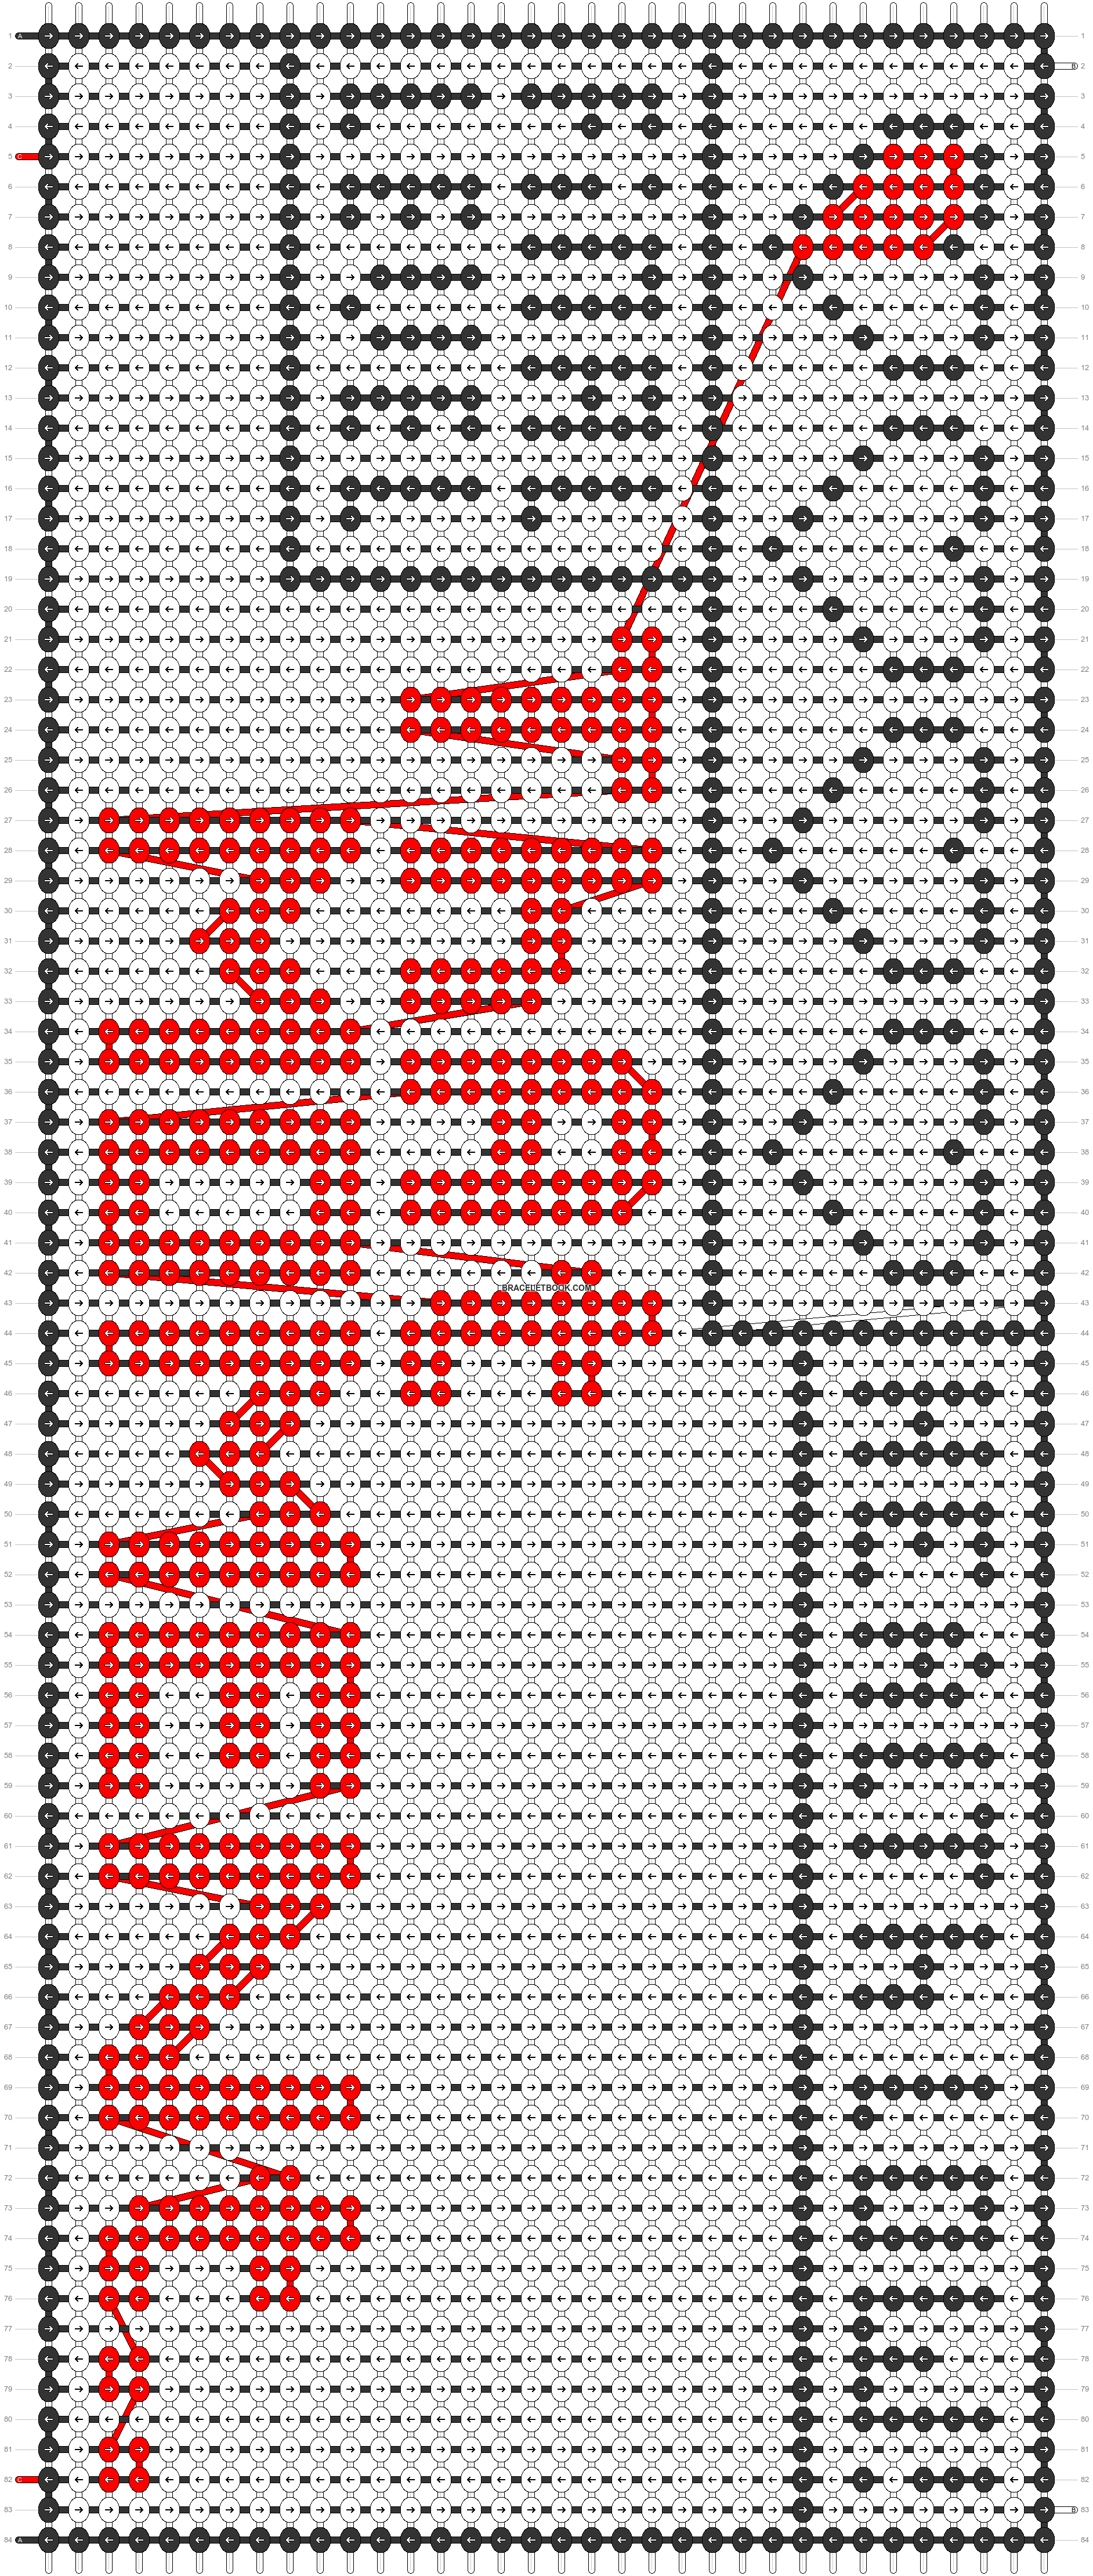 Alpha Pattern #4494 added by Chestnut